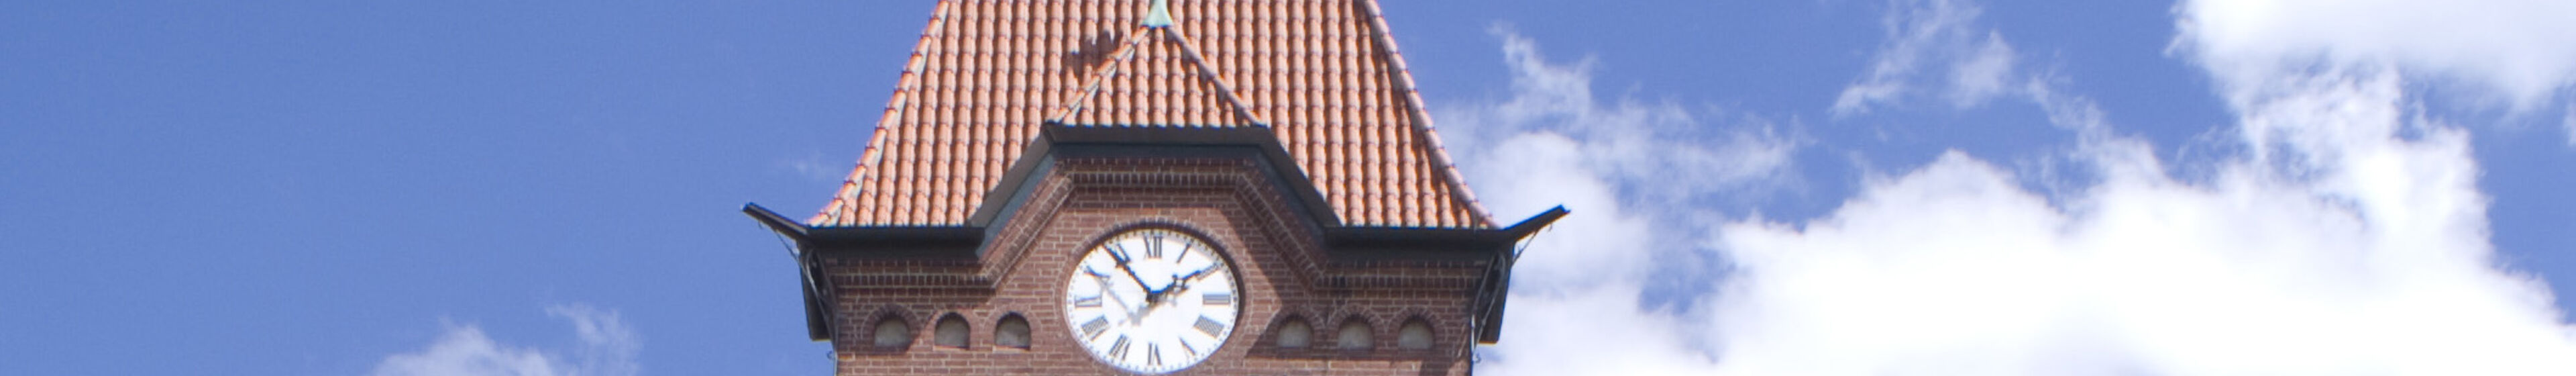 Dahlenburg uhr kopfbild